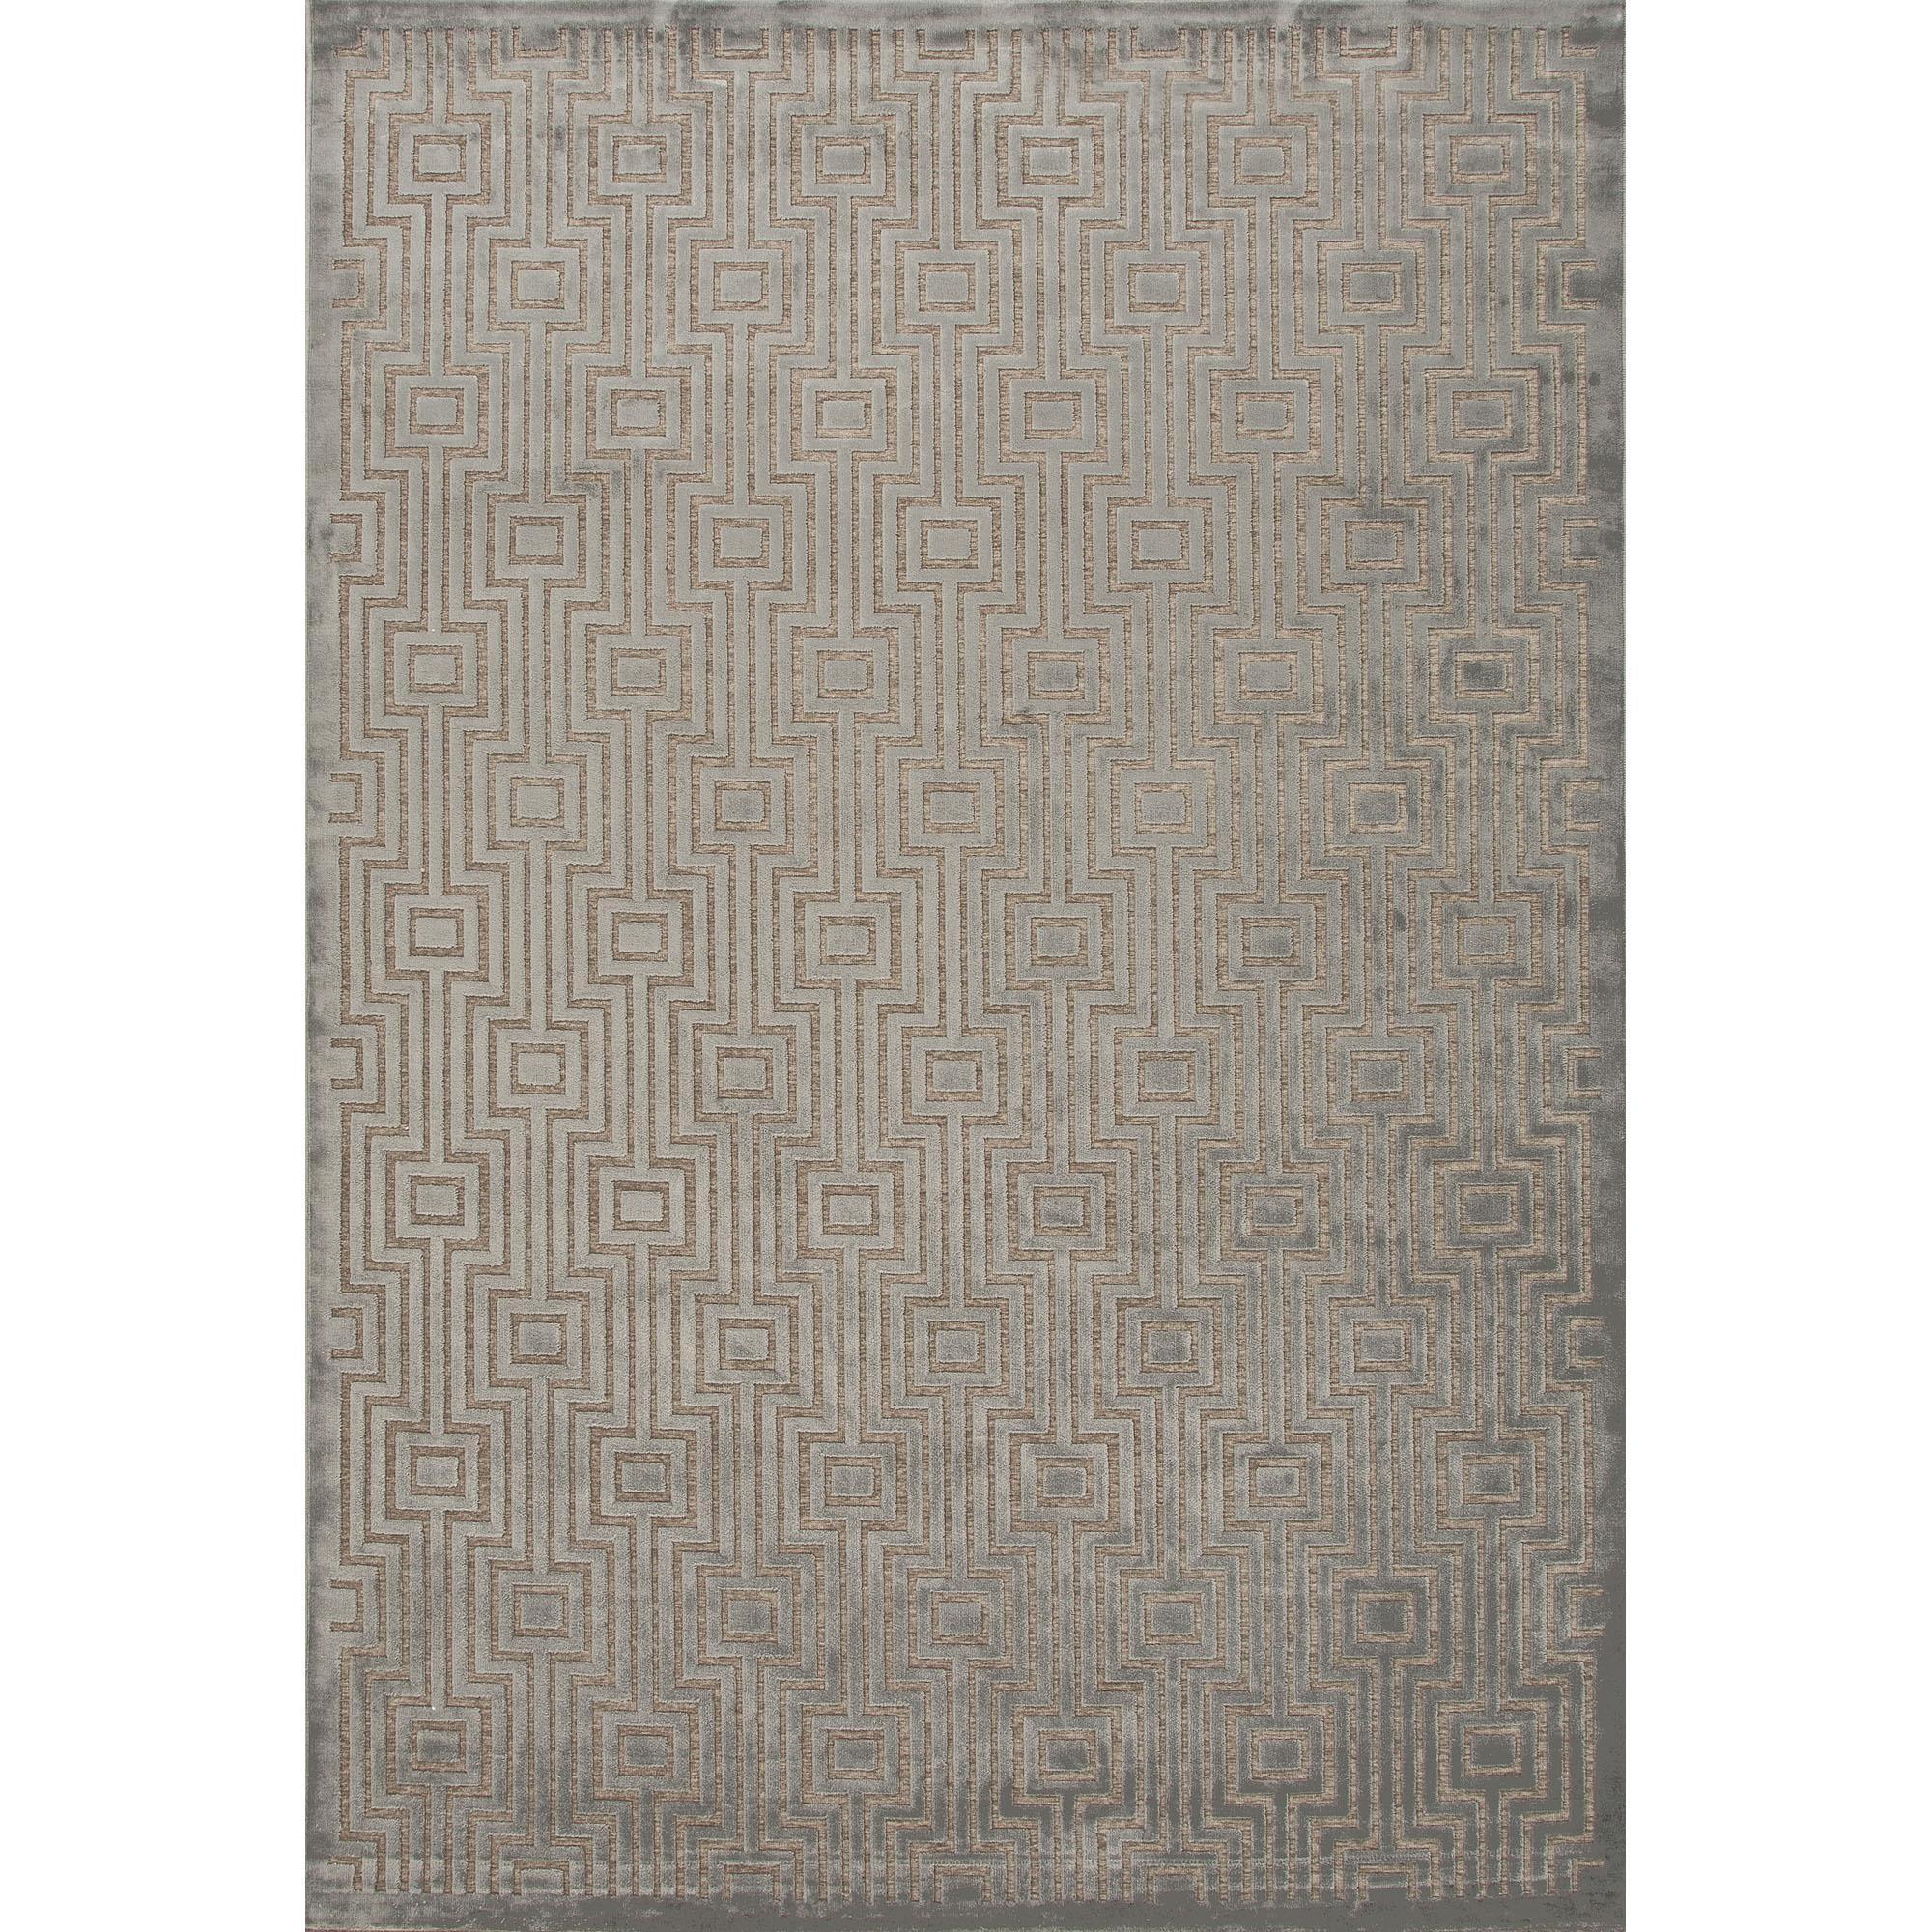 JAIPUR Rugs Fables 2 x 3 Rug - Item Number: RUG113554